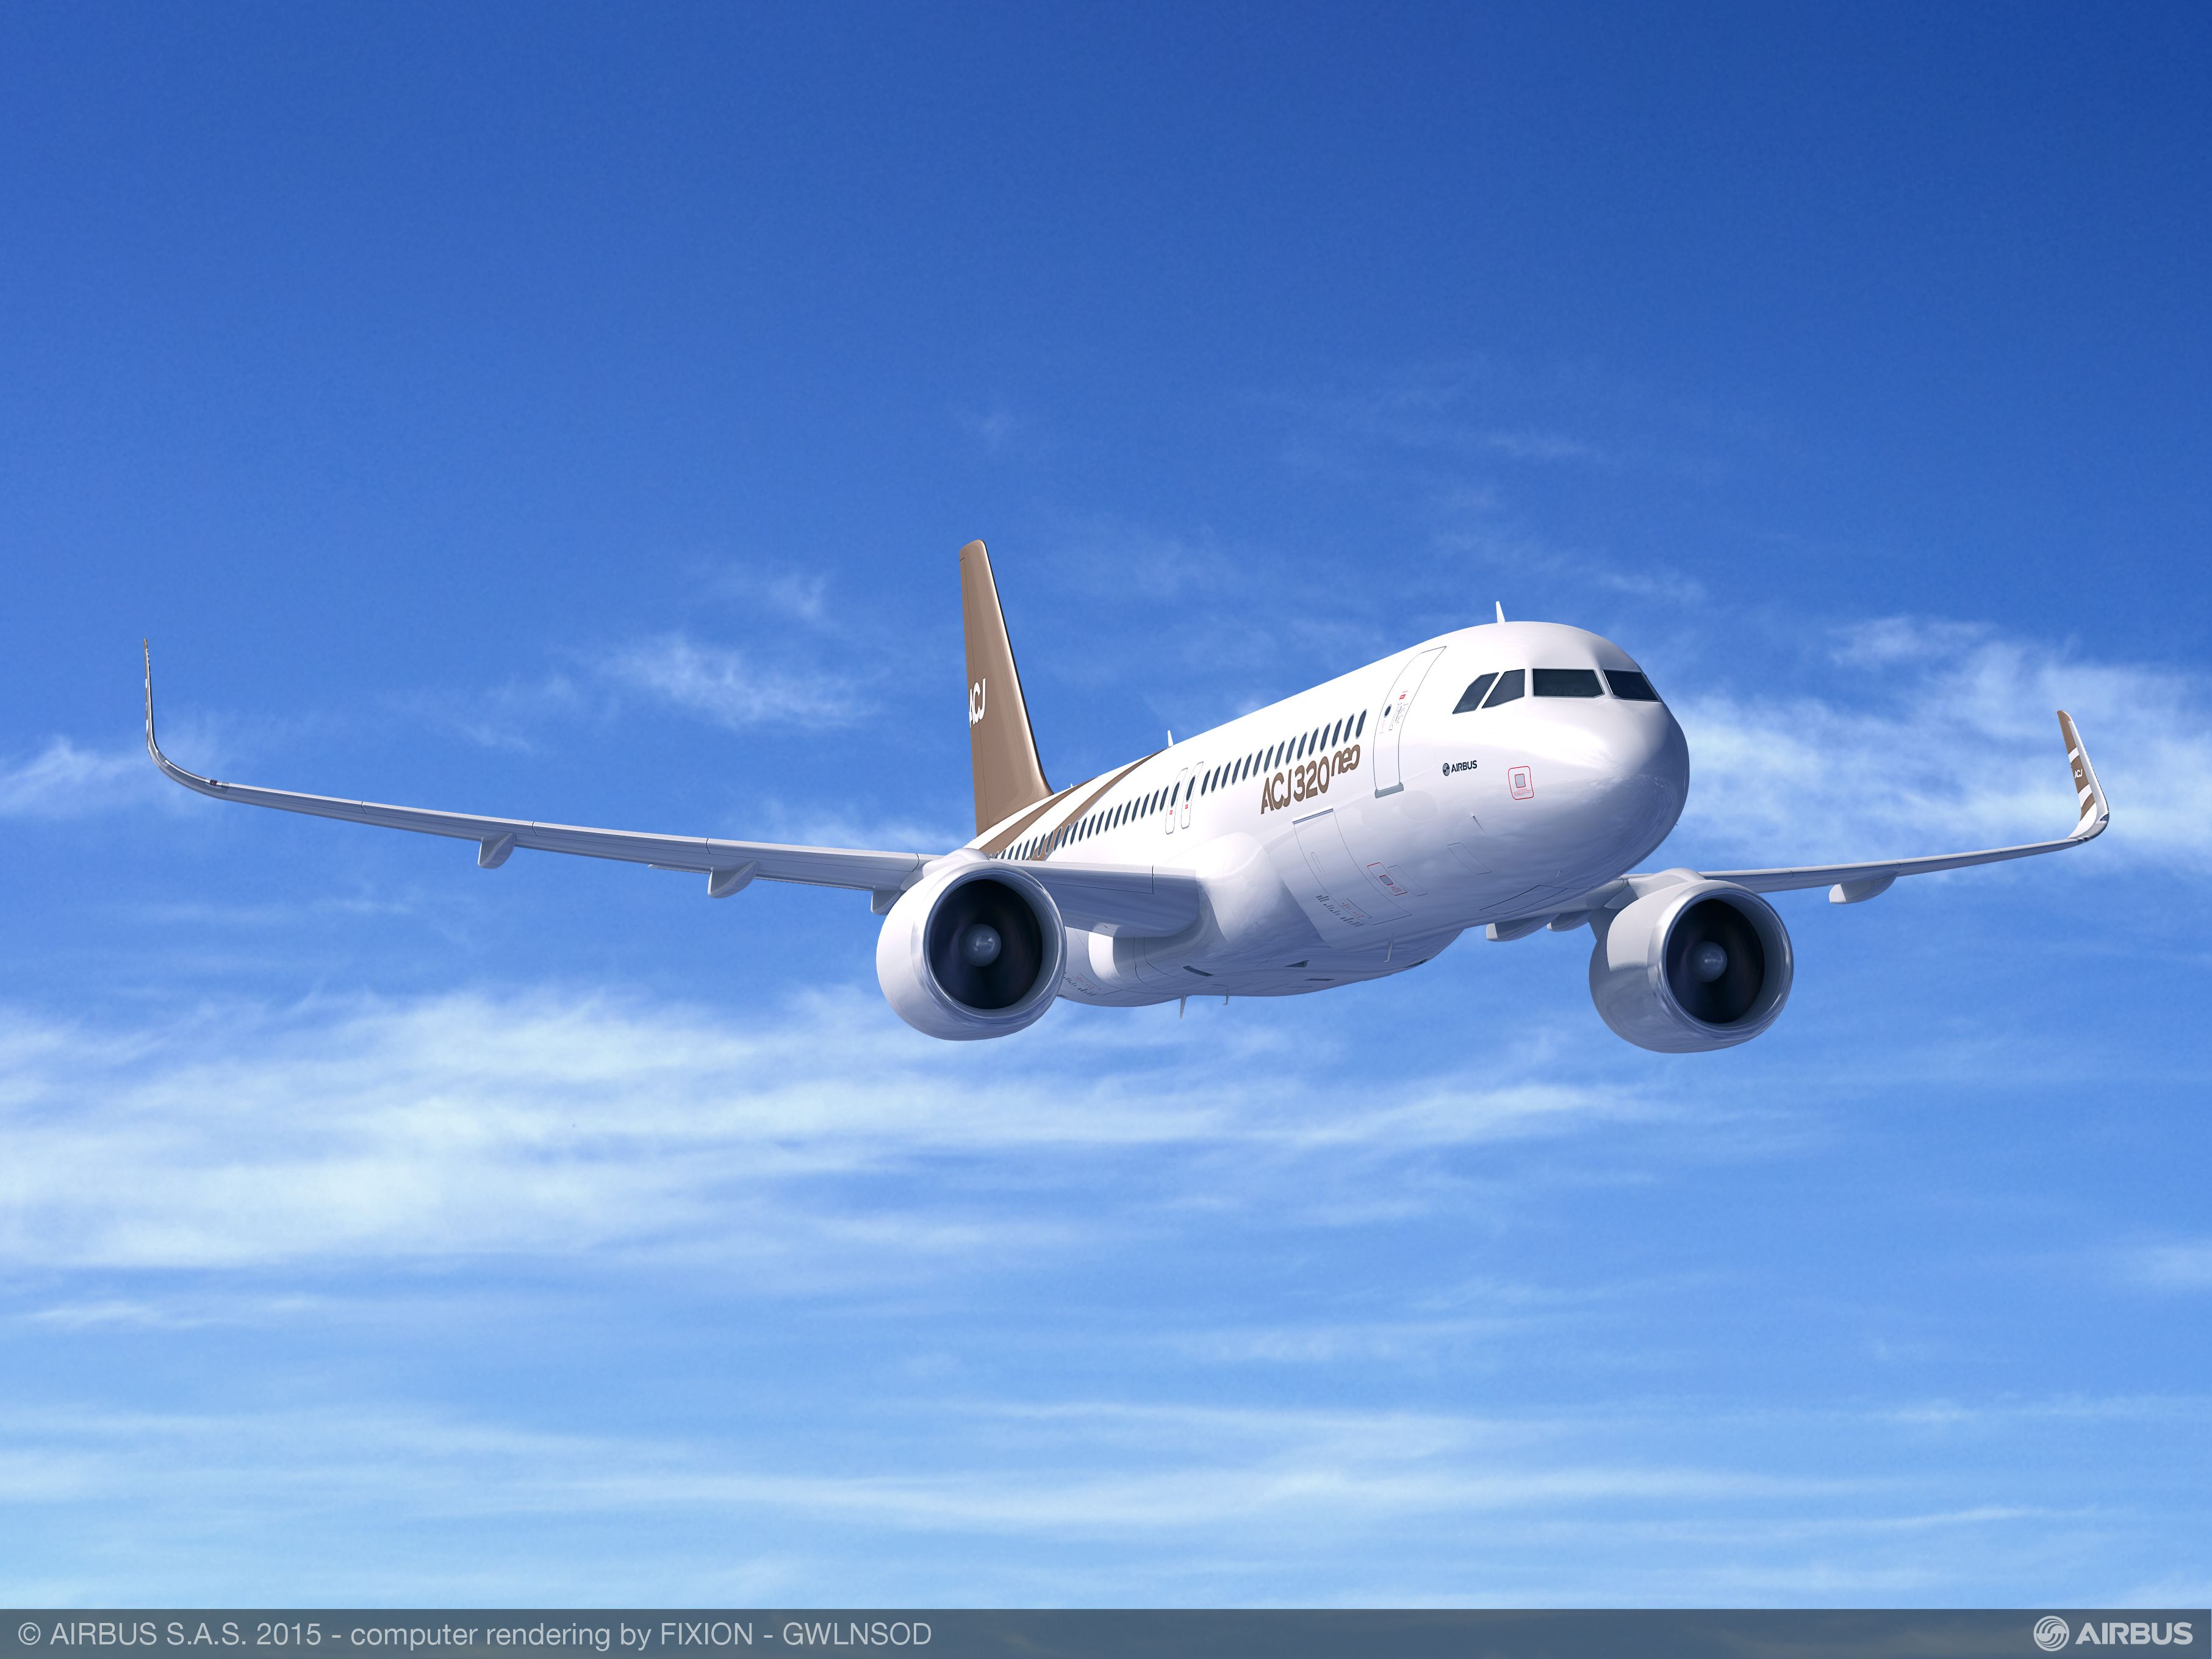 Den nye ACJ320neo fra den europæiske flyproducent Airbus. Foto:  Airbus